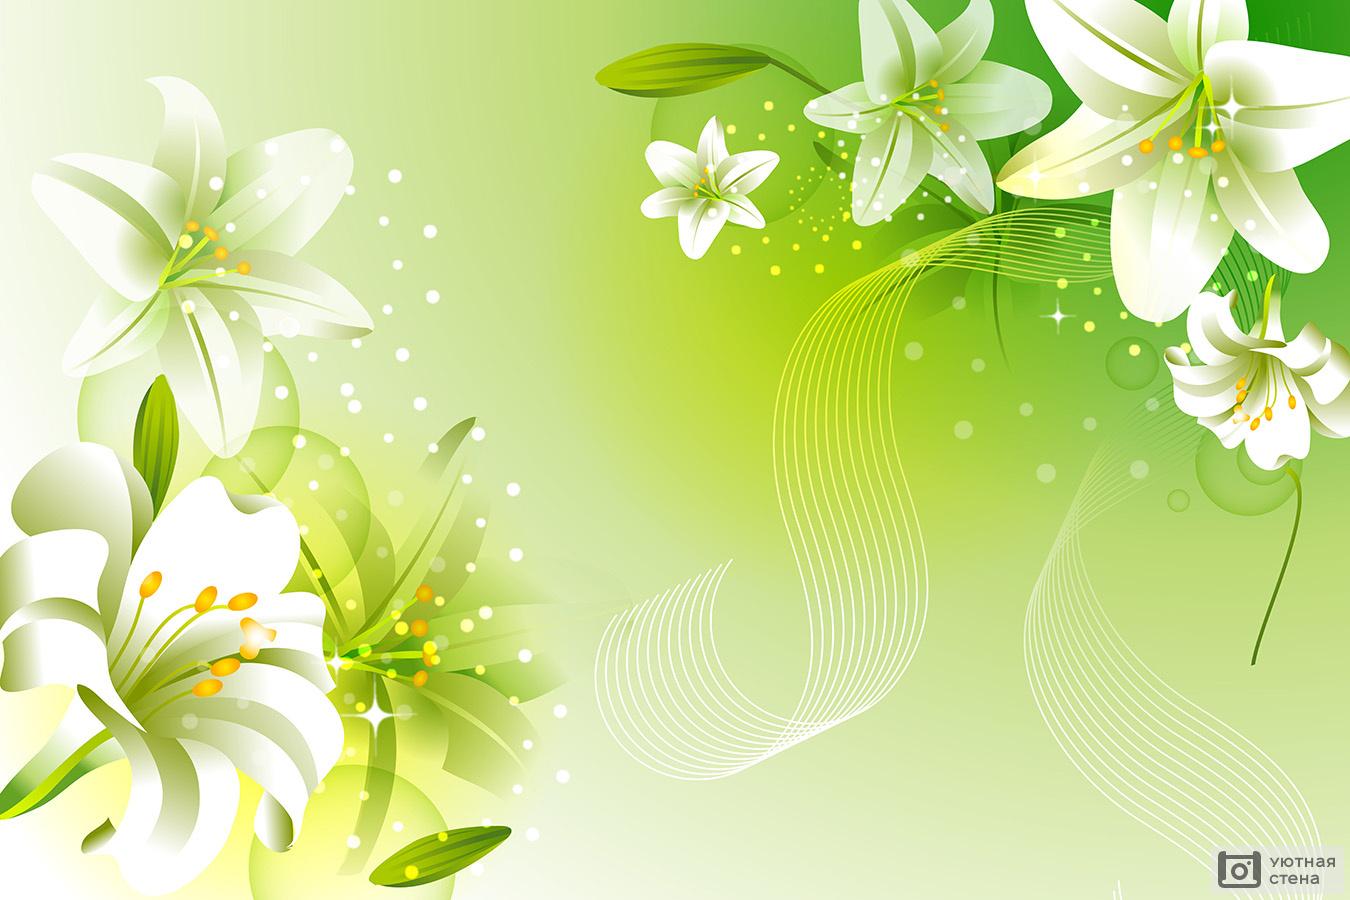 Сердечко, шаблоны открытки с лилиями